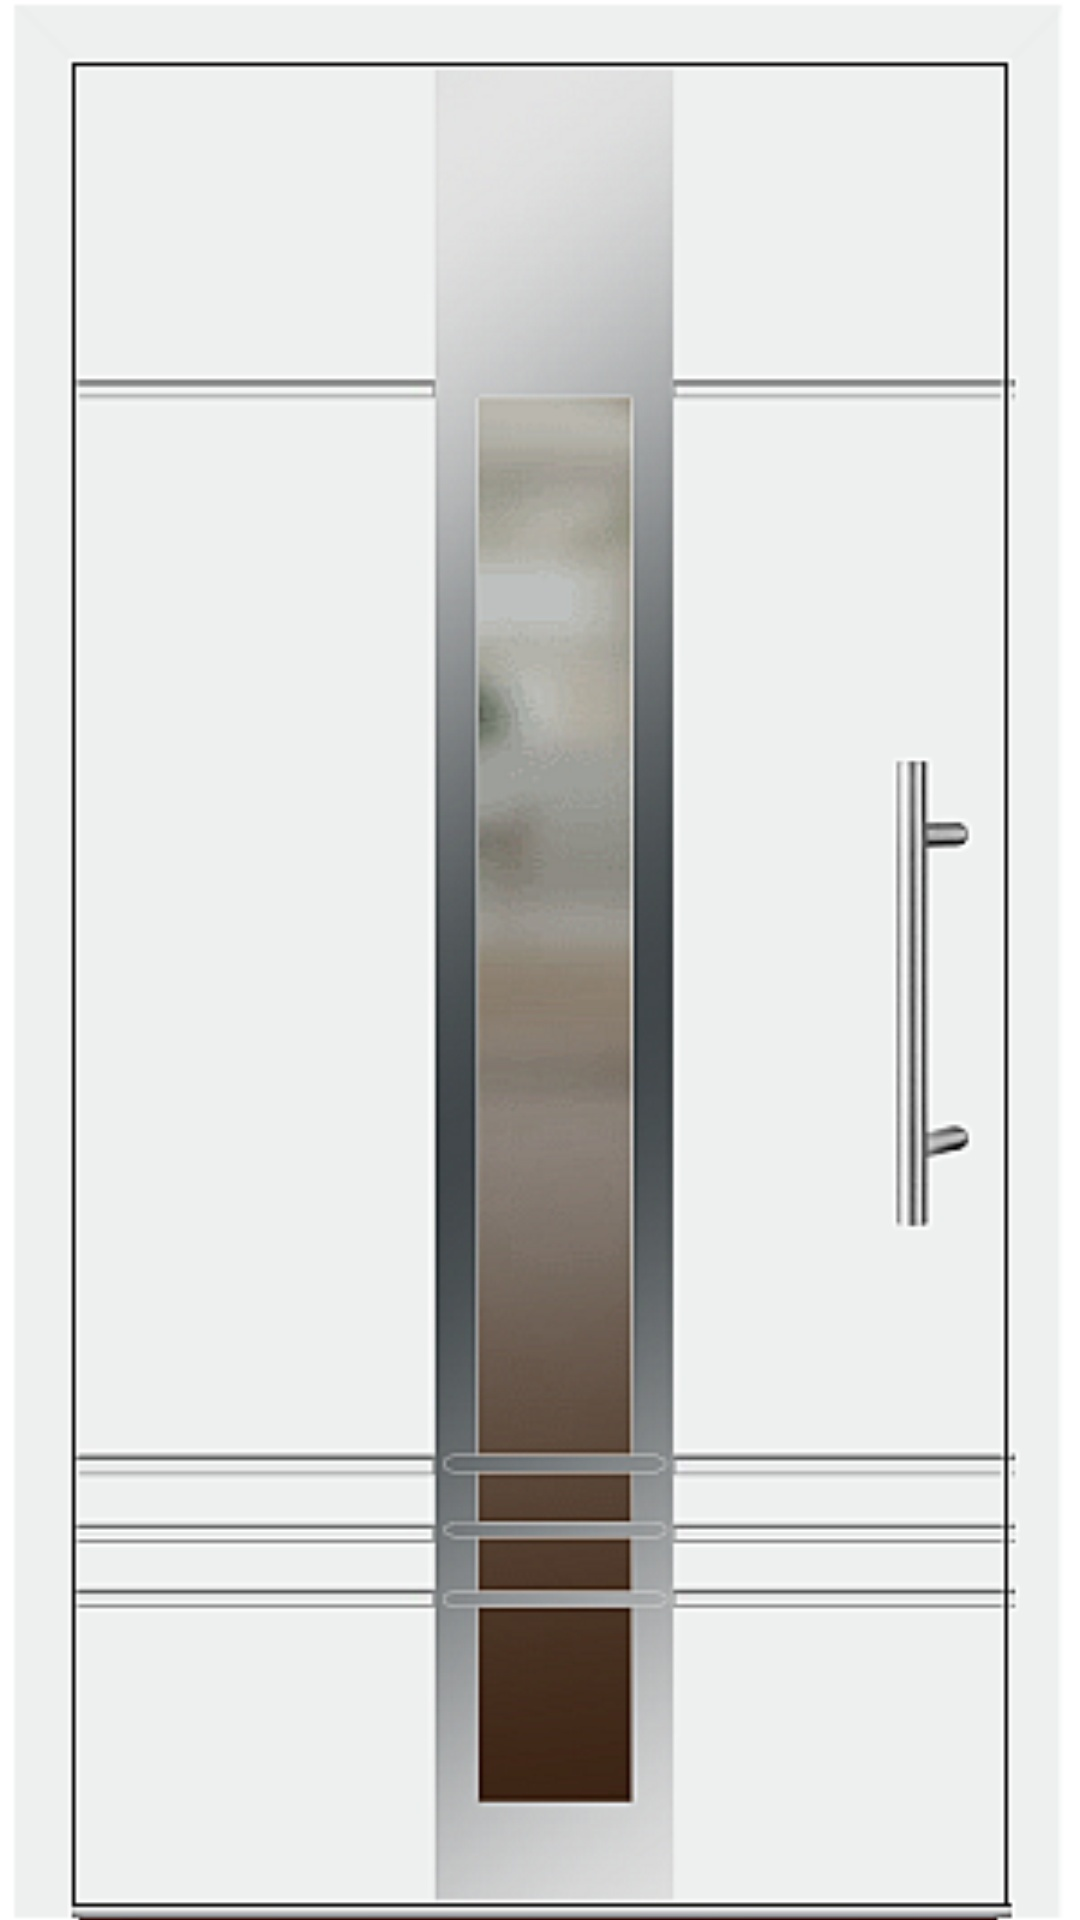 Aluminium Haustür Modell 6469-79 weiß